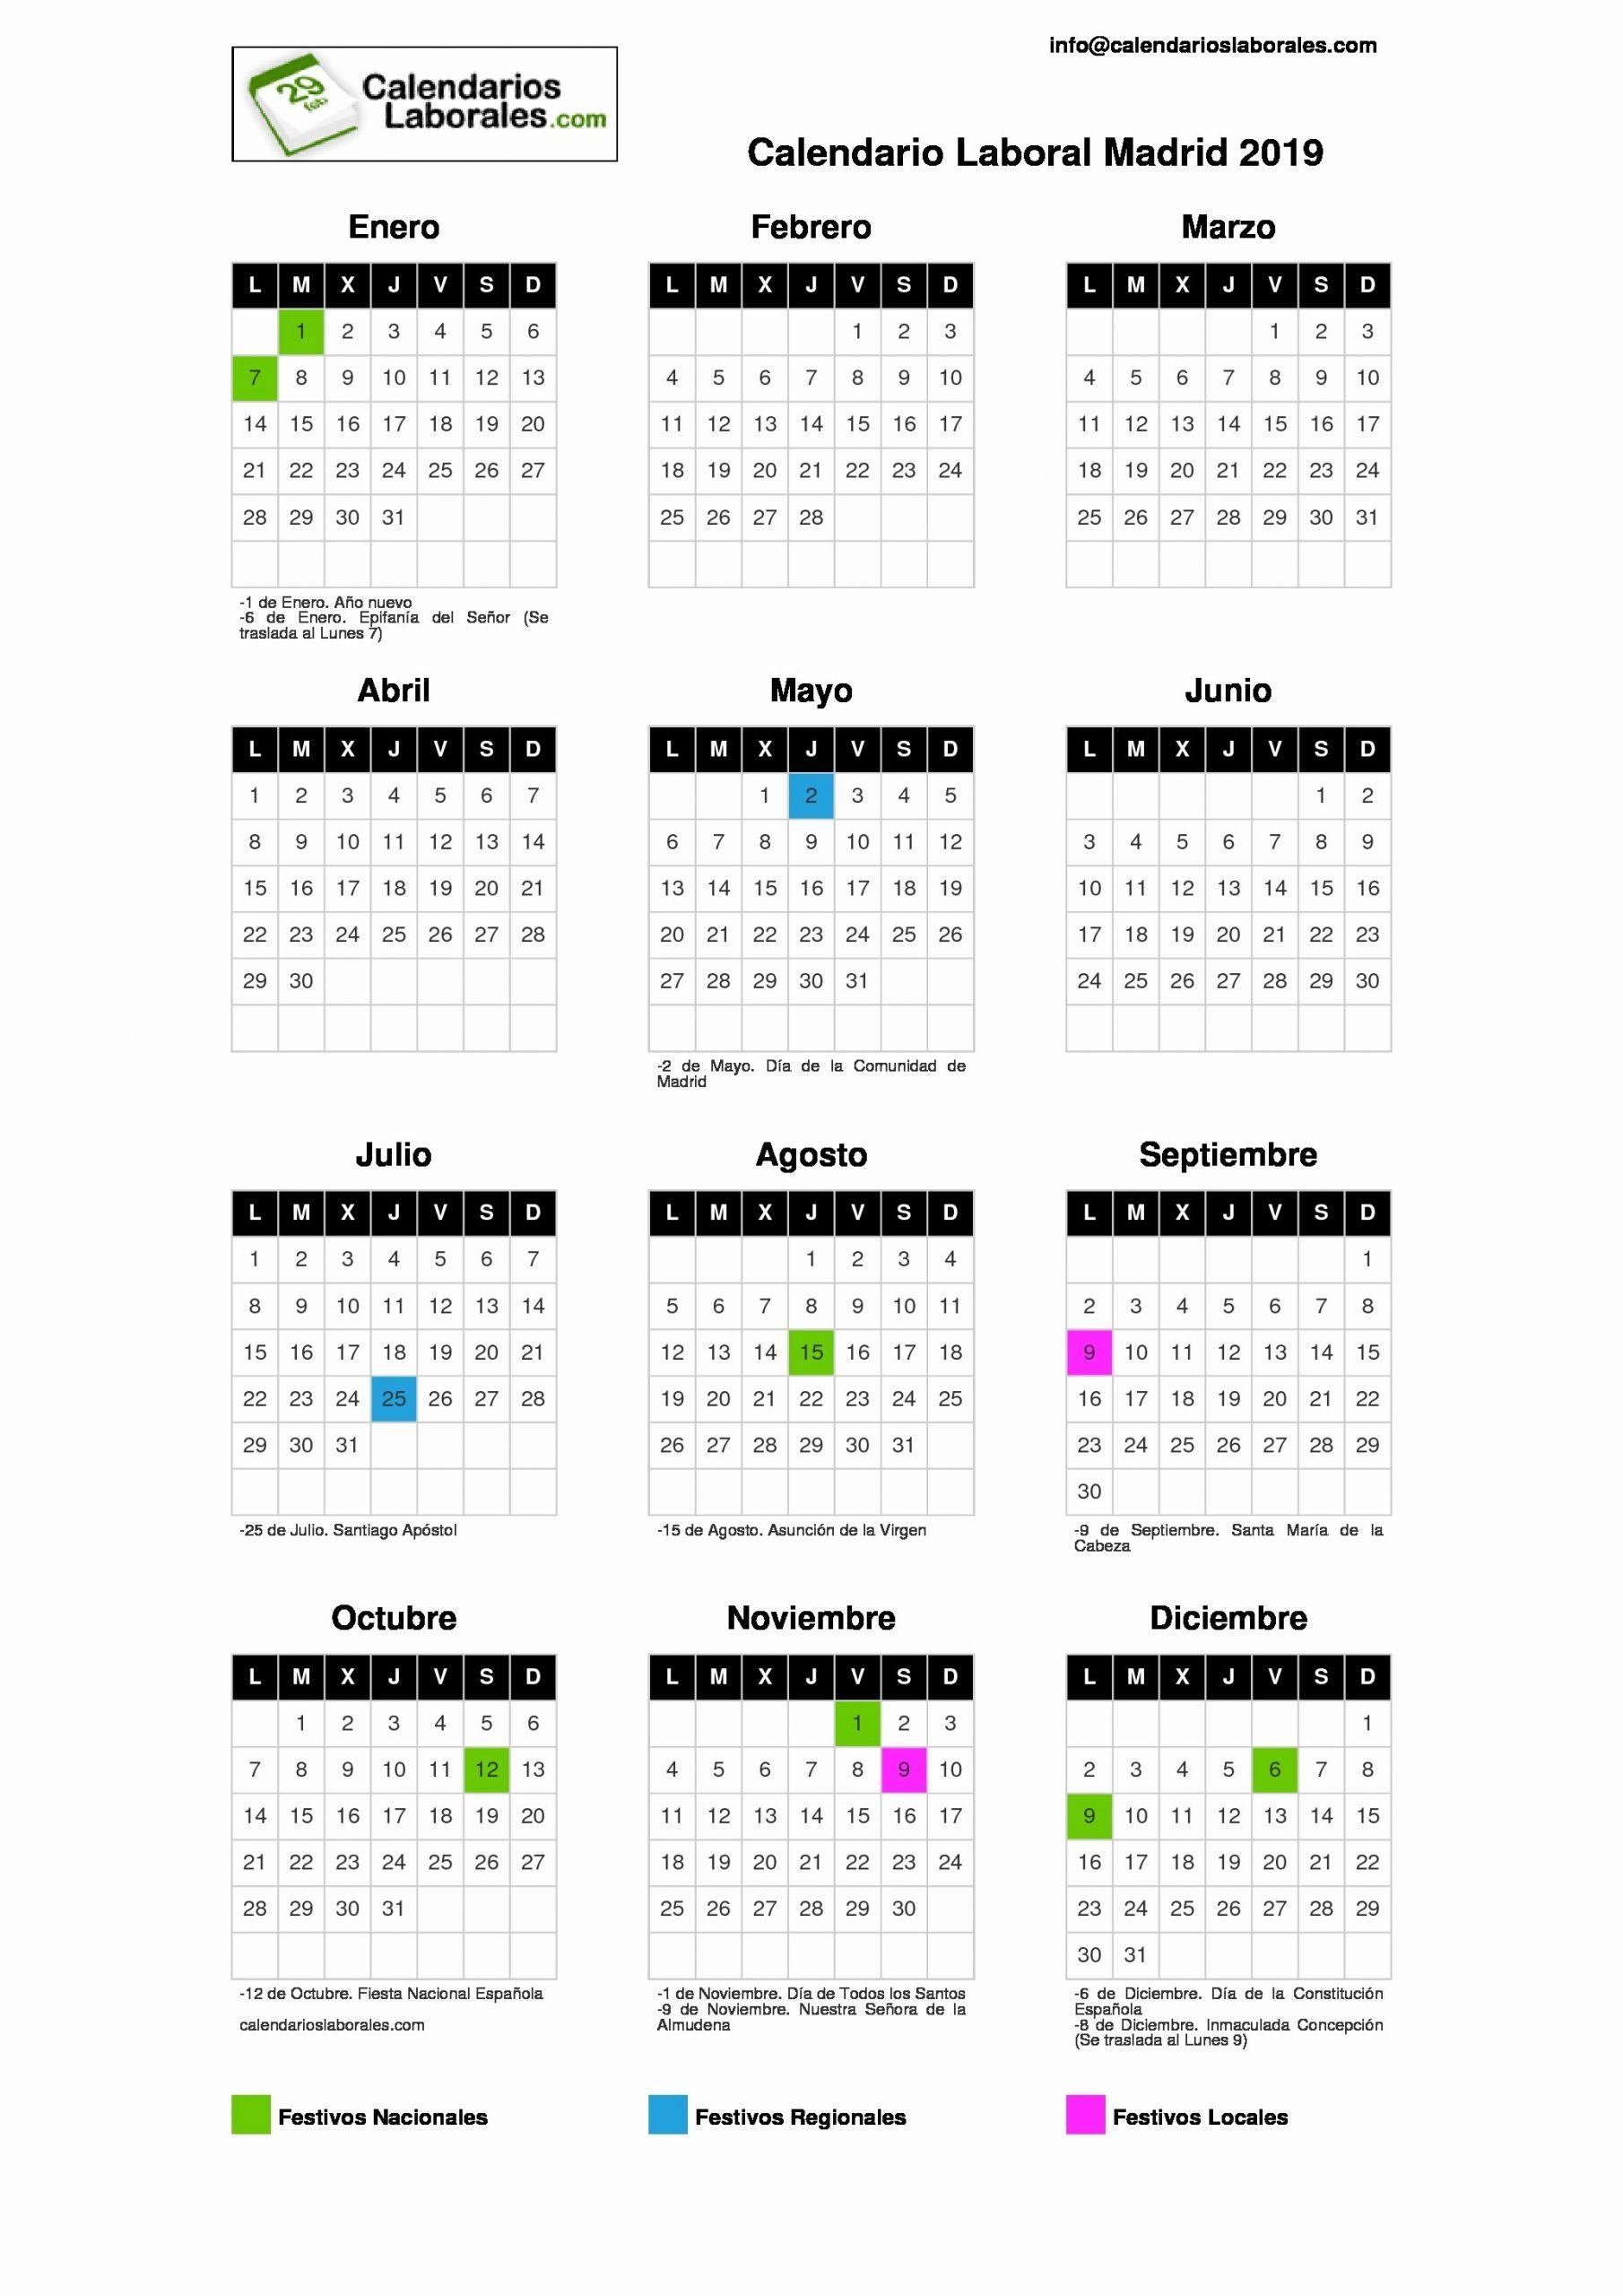 calendario laboral 2019 argentina mas caliente calendario dr 2019 calendario laboral madrid 2019 of calendario laboral 2019 argentina